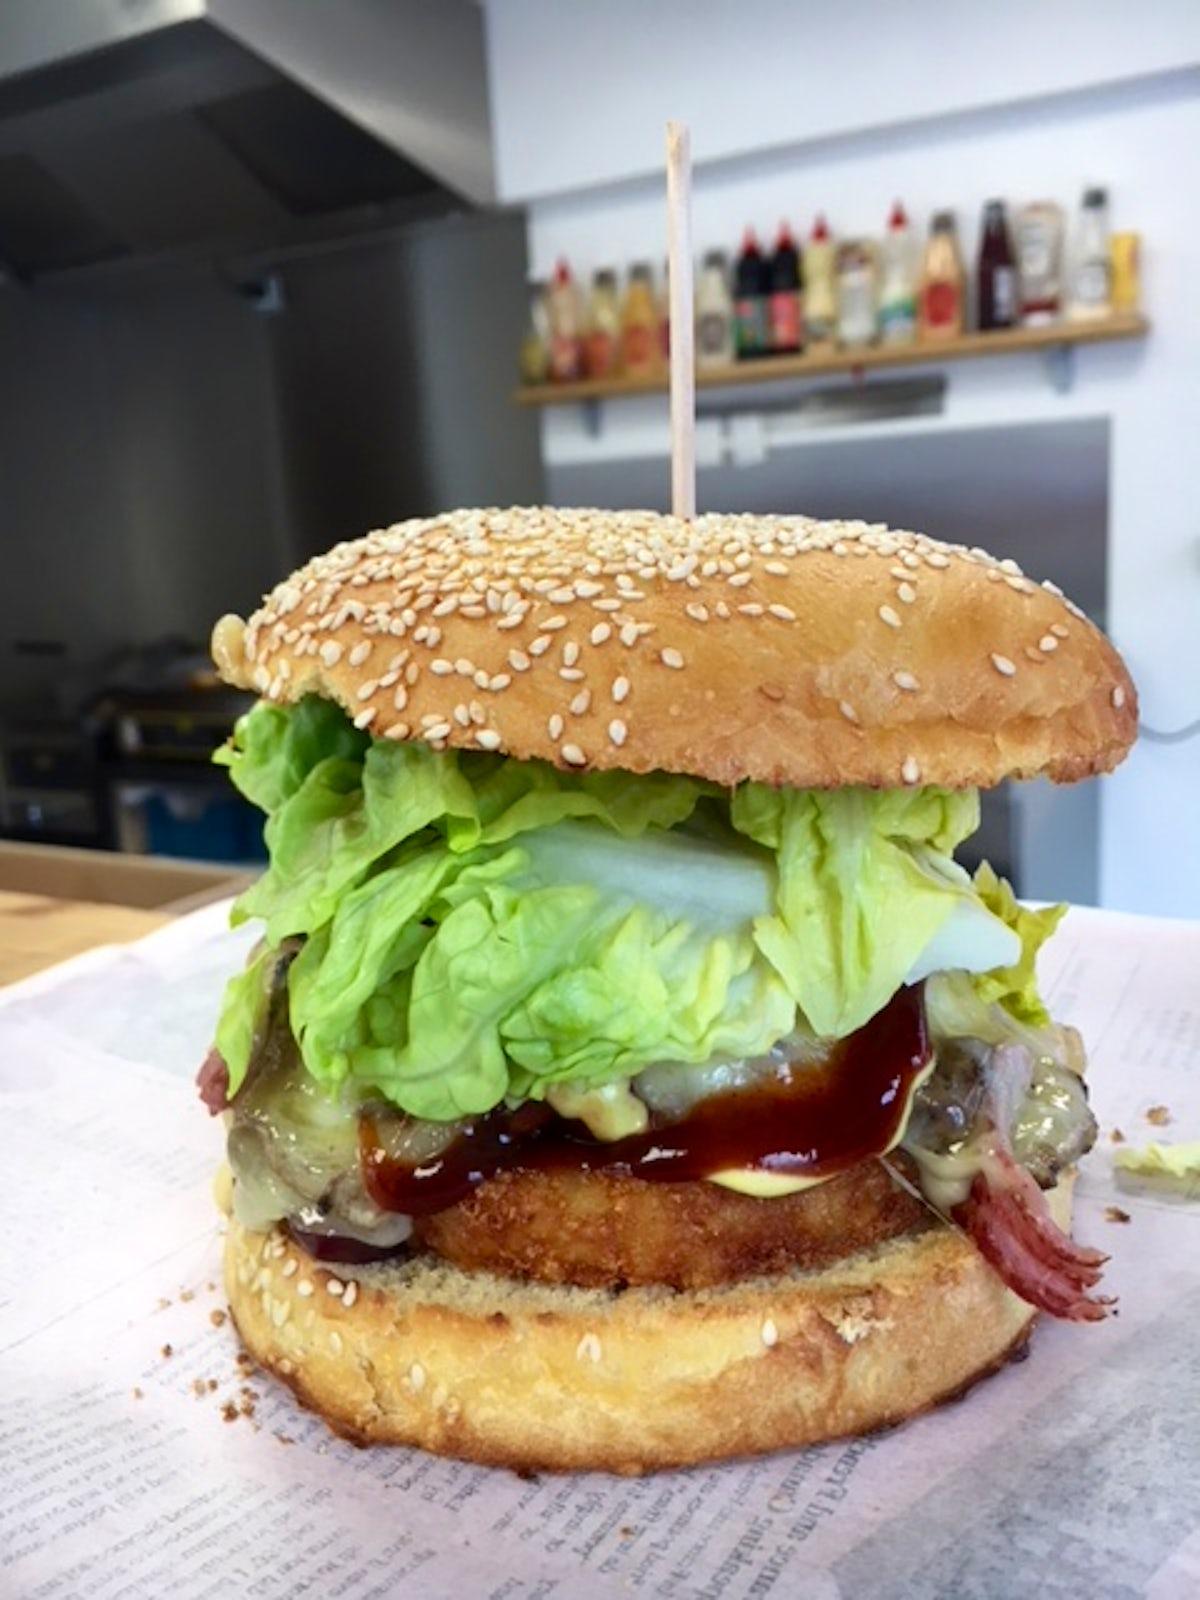 Chez Toto - Probably the best Burgers around Morzine